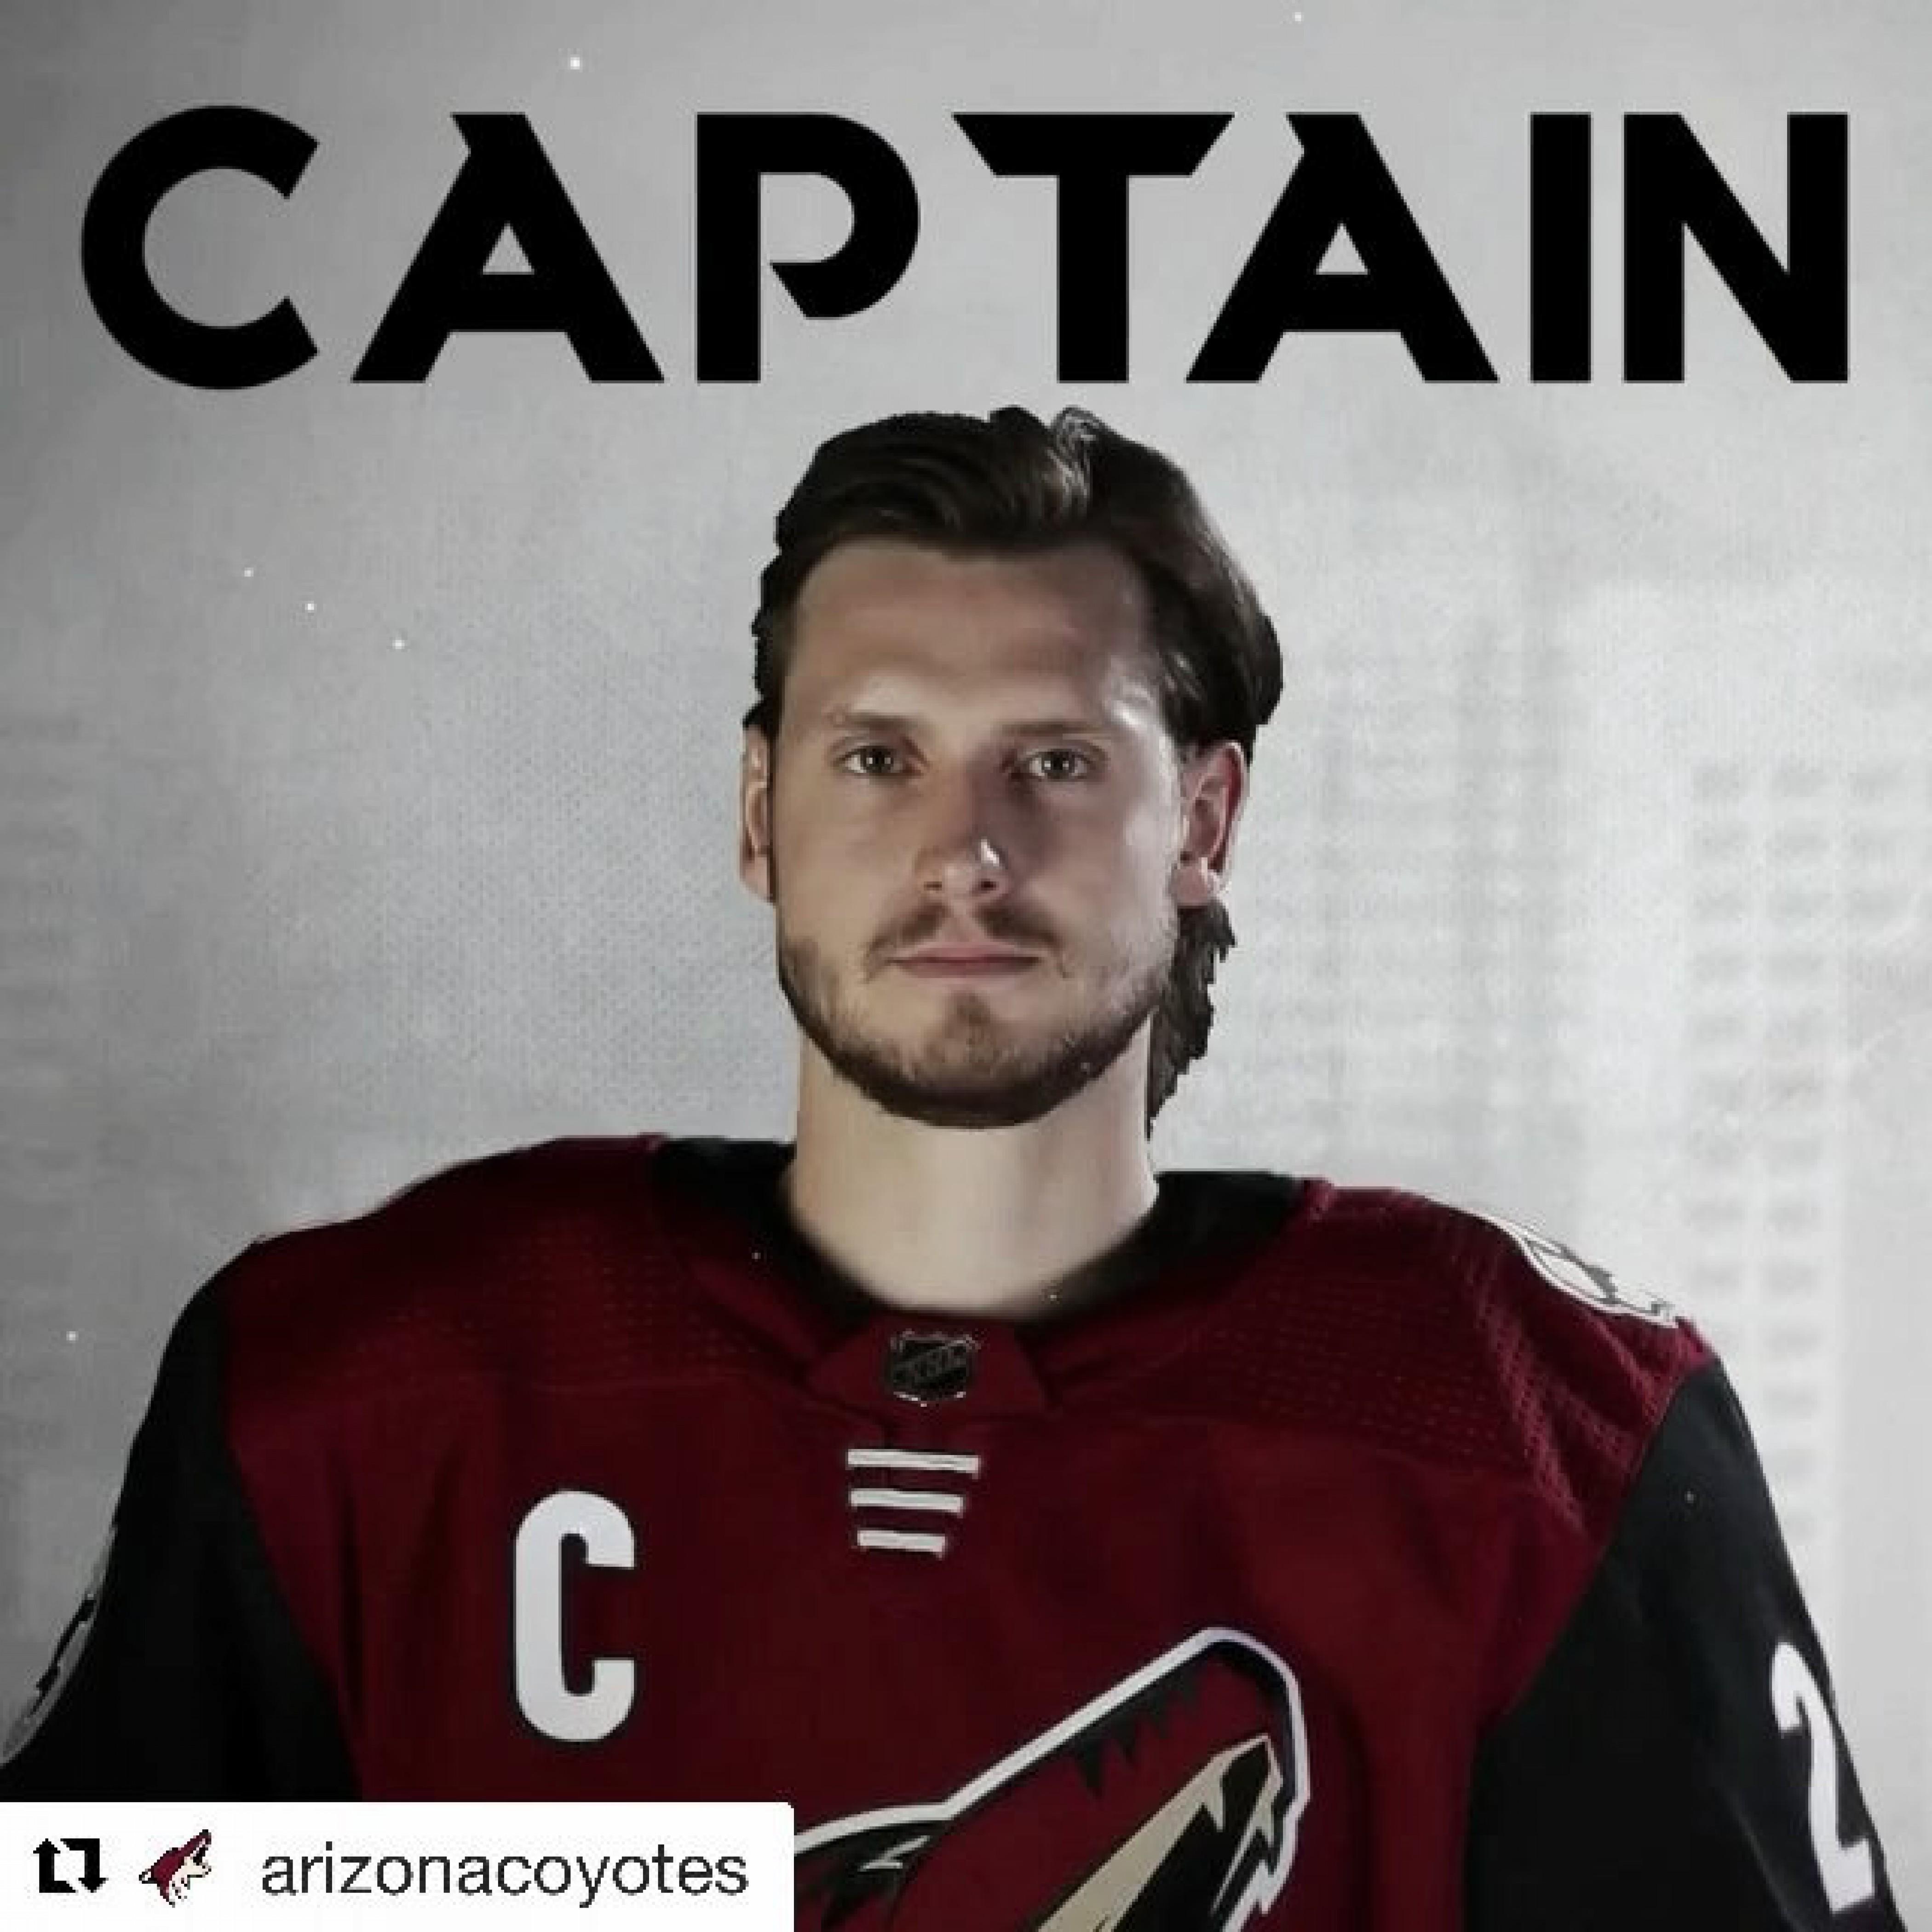 Arizona Coyotes: Oliver Ekman-Larsson named new captain